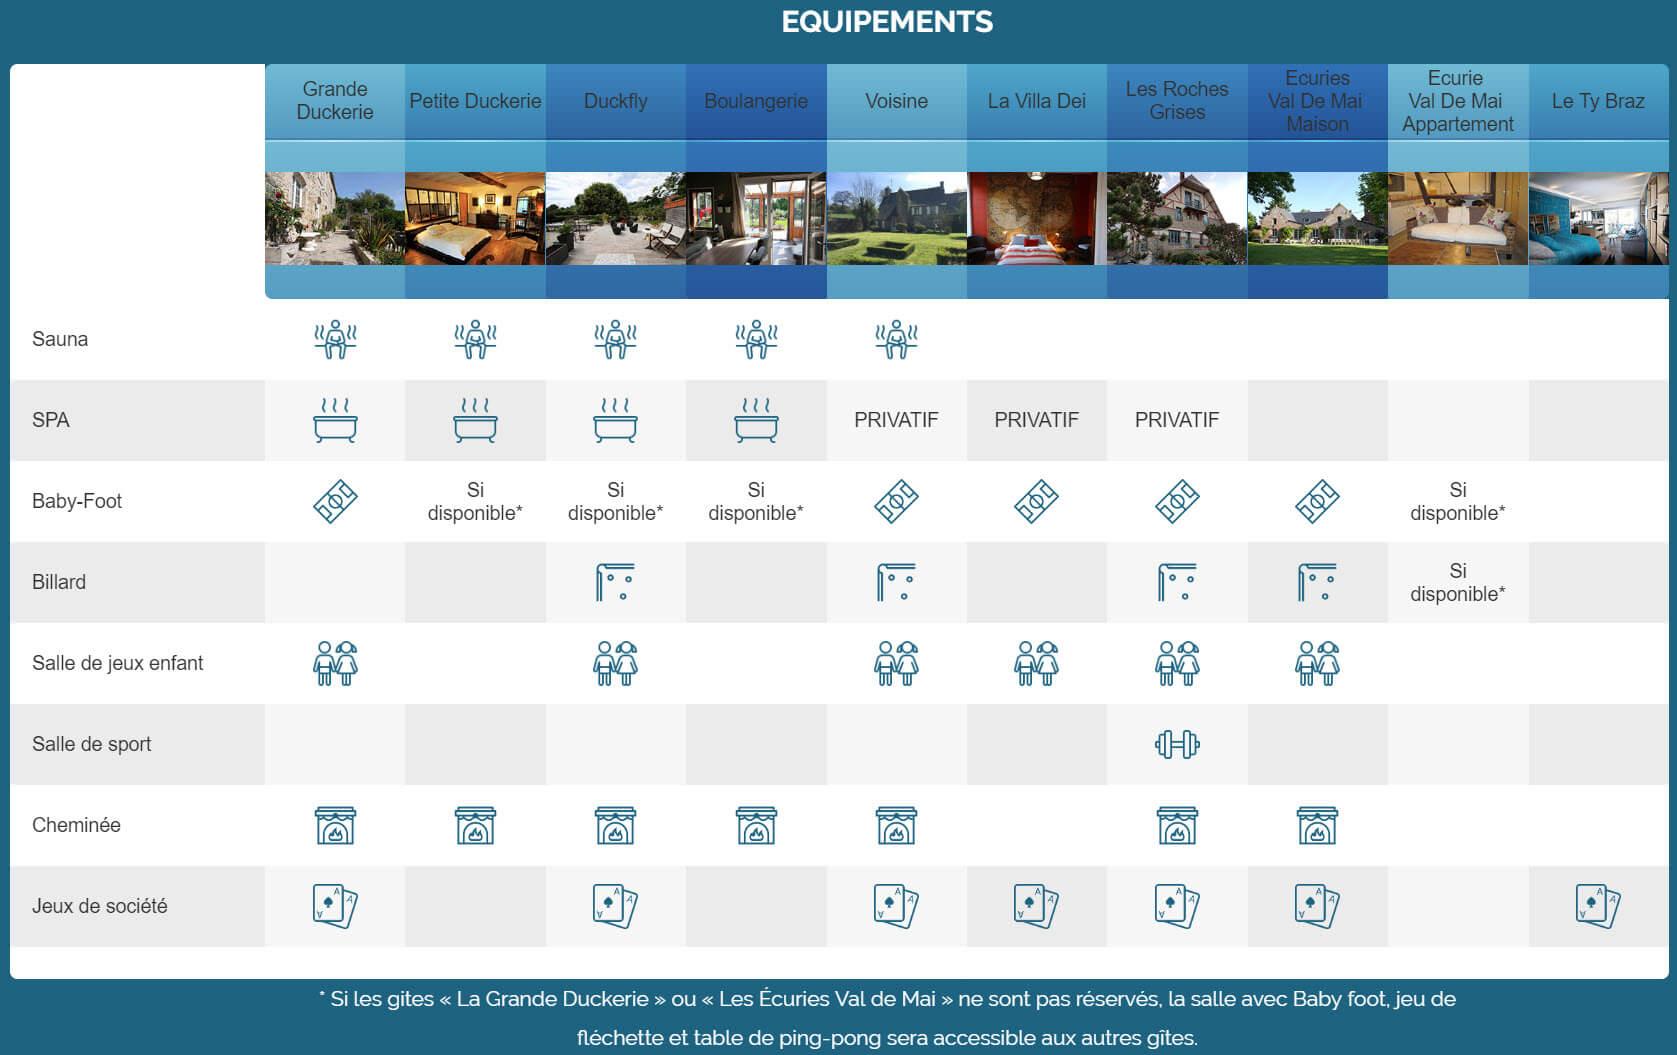 Equipement - Homepage - Location de Gite La Clef Decamp - Laclefdecamp.fr